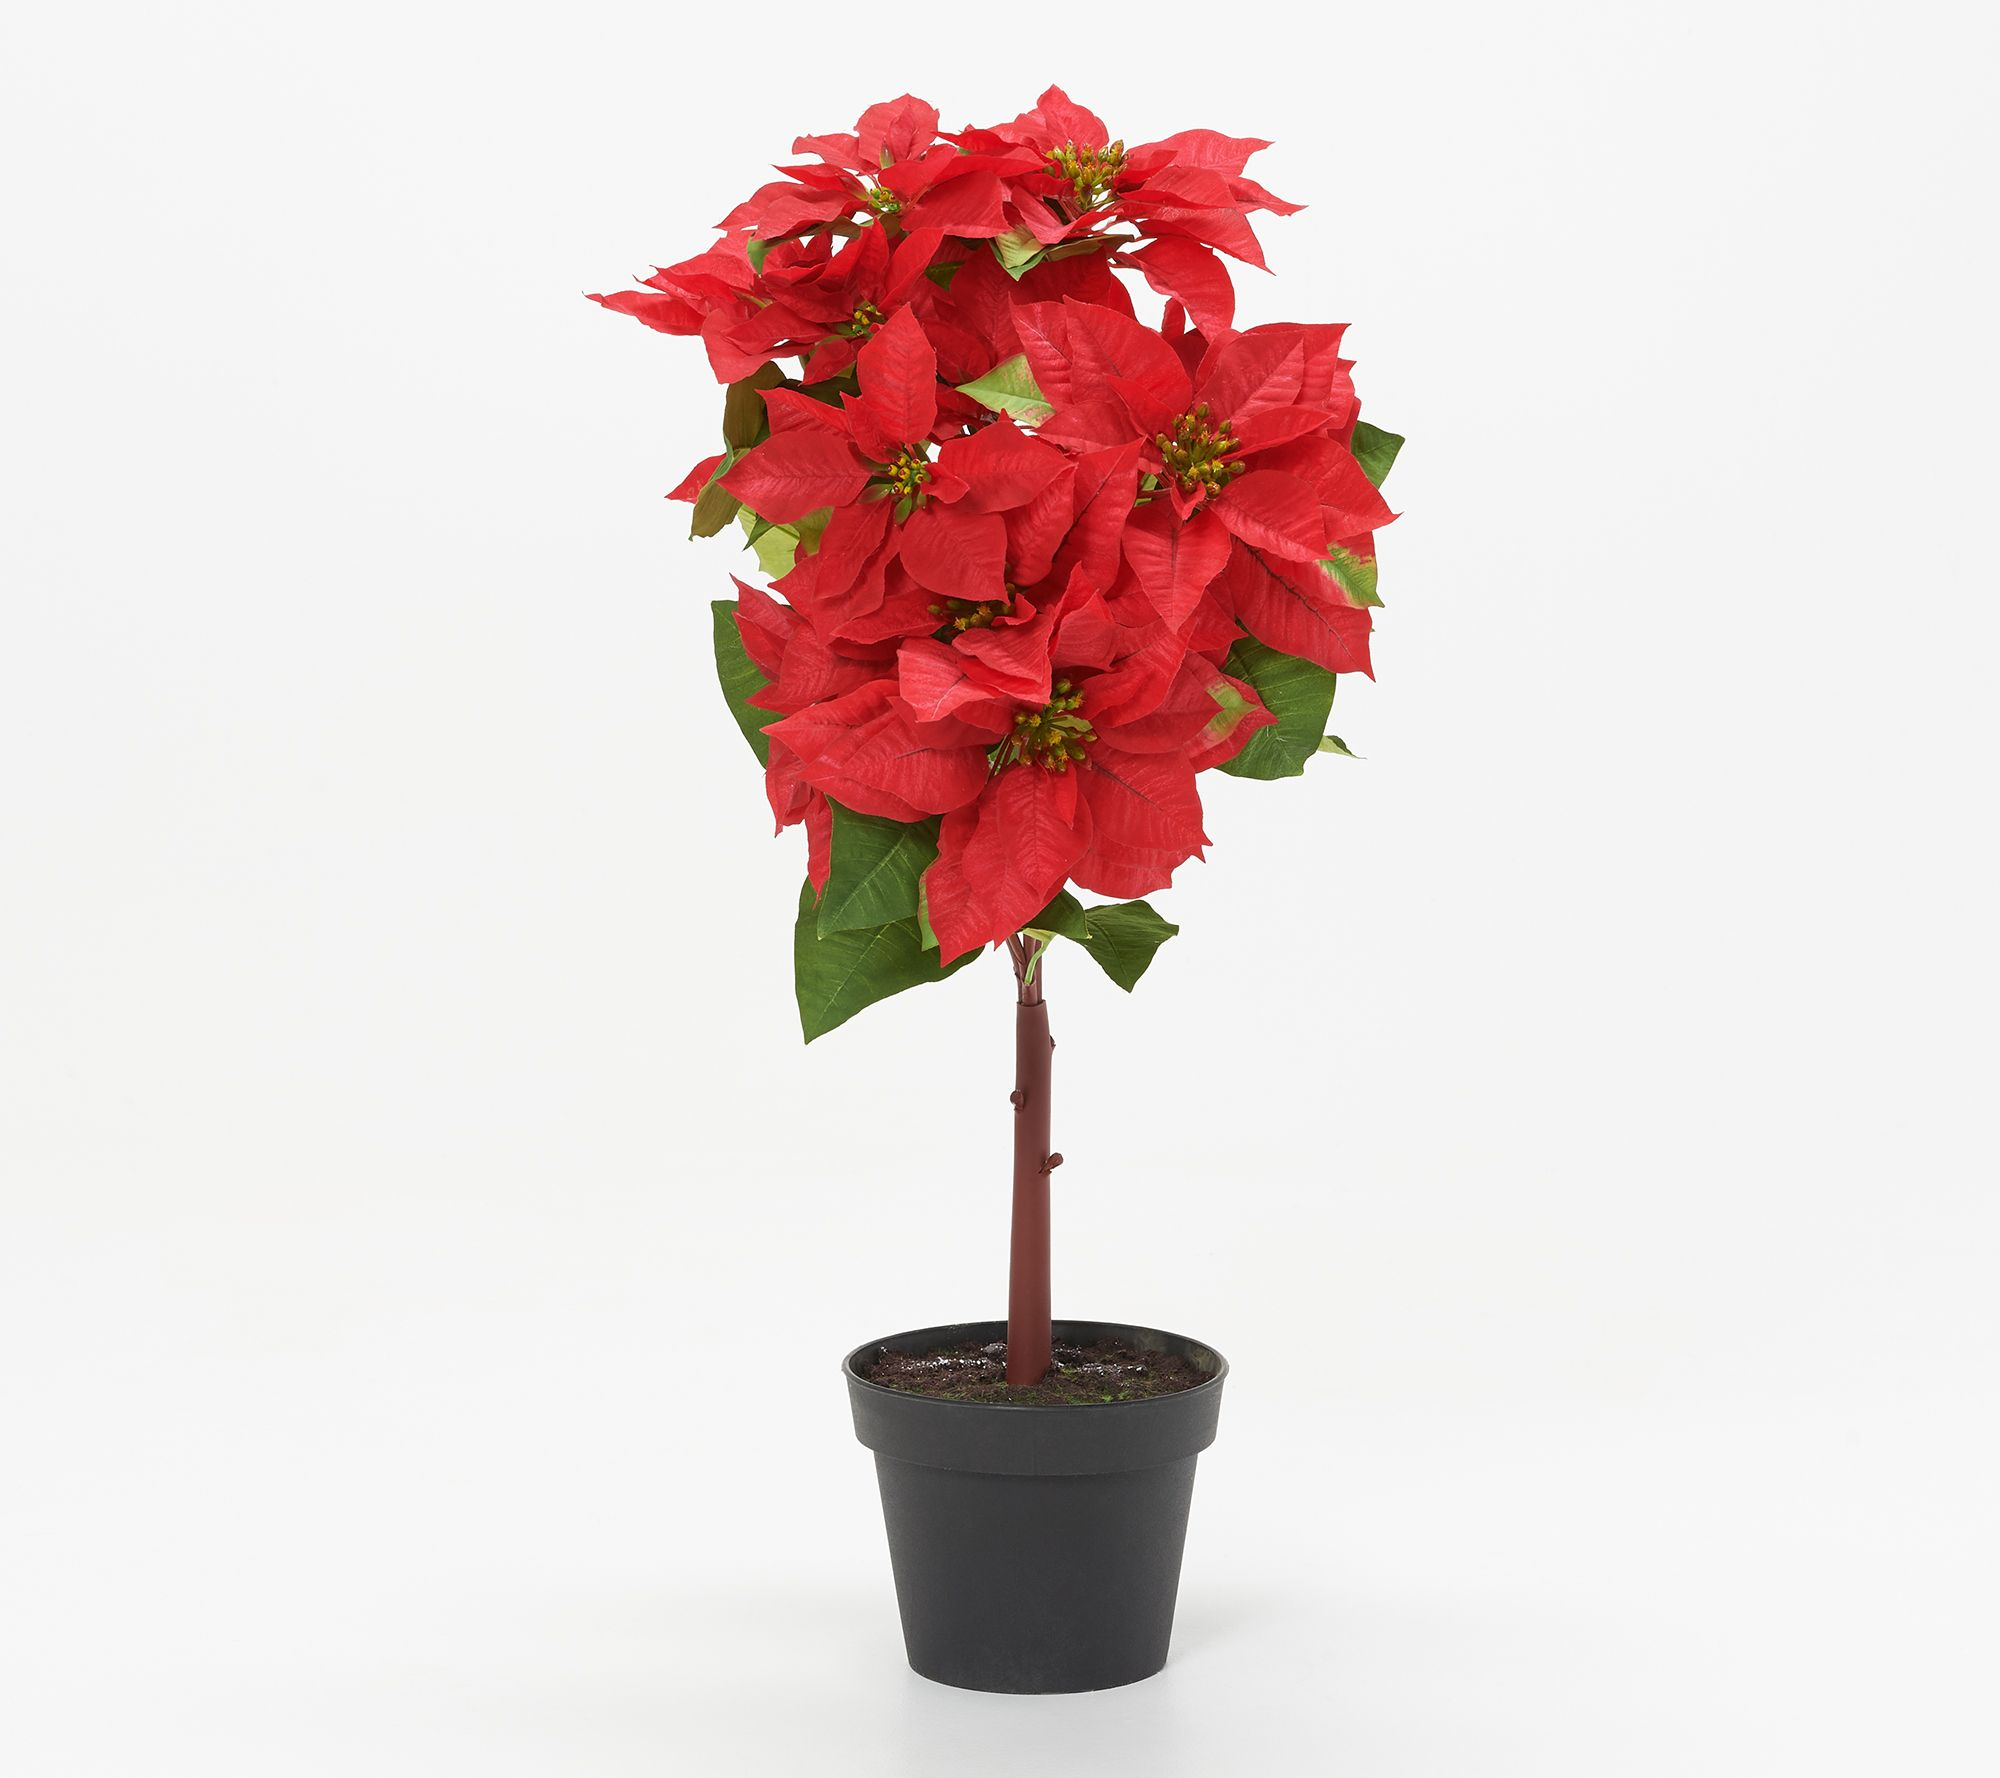 32% off a faux Poinsettia tree plant